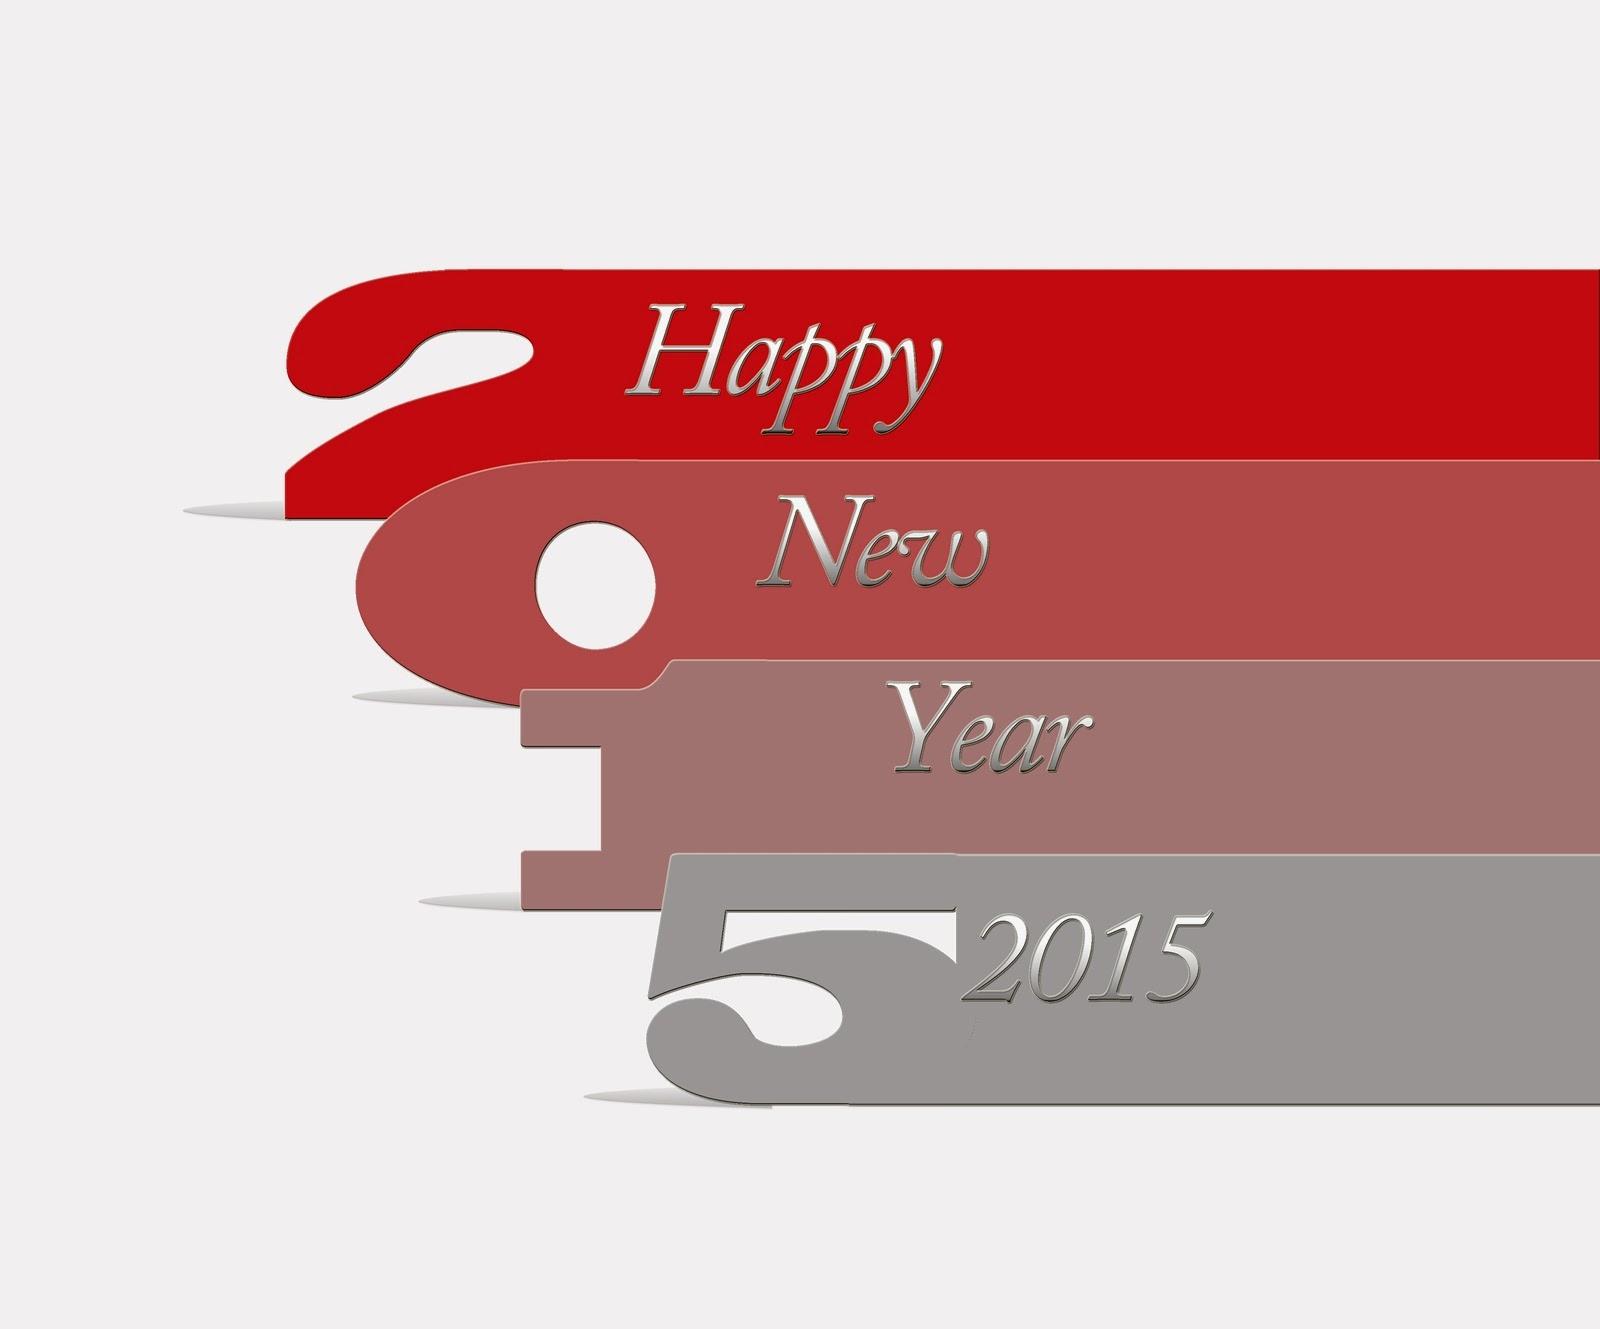 Happy New Year 2015 Funny Desktop